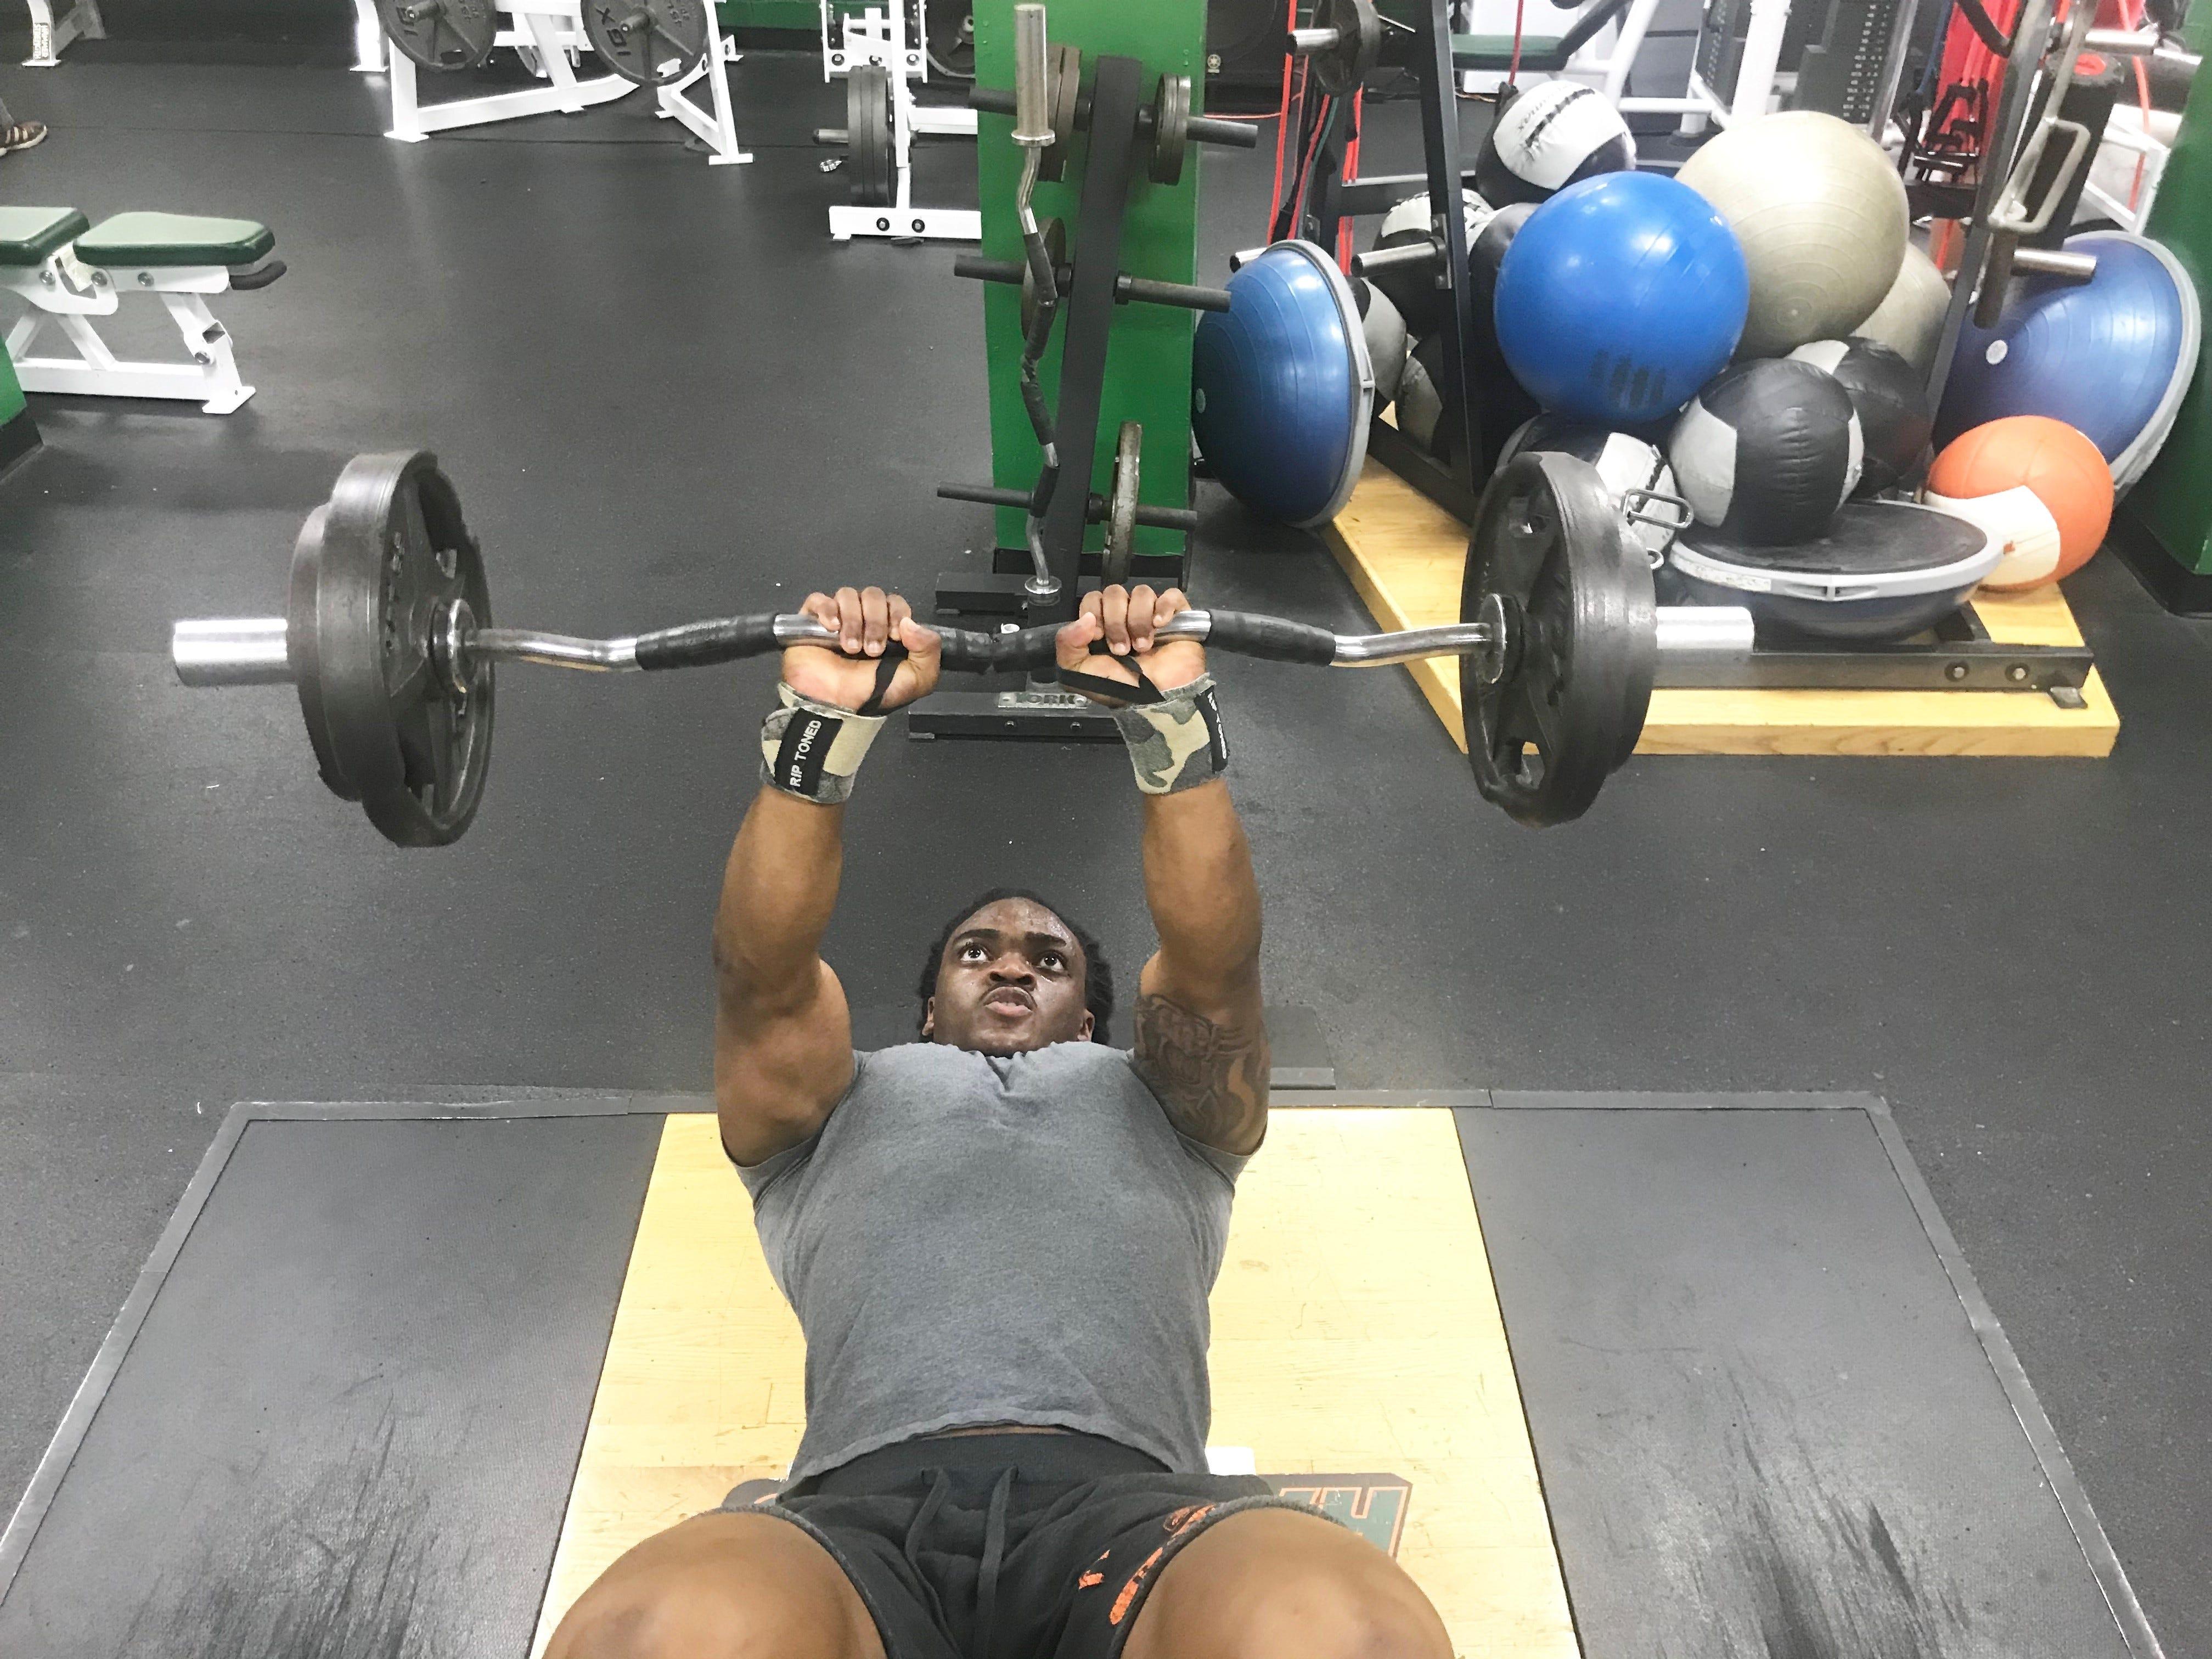 FAMU running back Eddie Tillman lifts 95 pounds on the skull crushers.